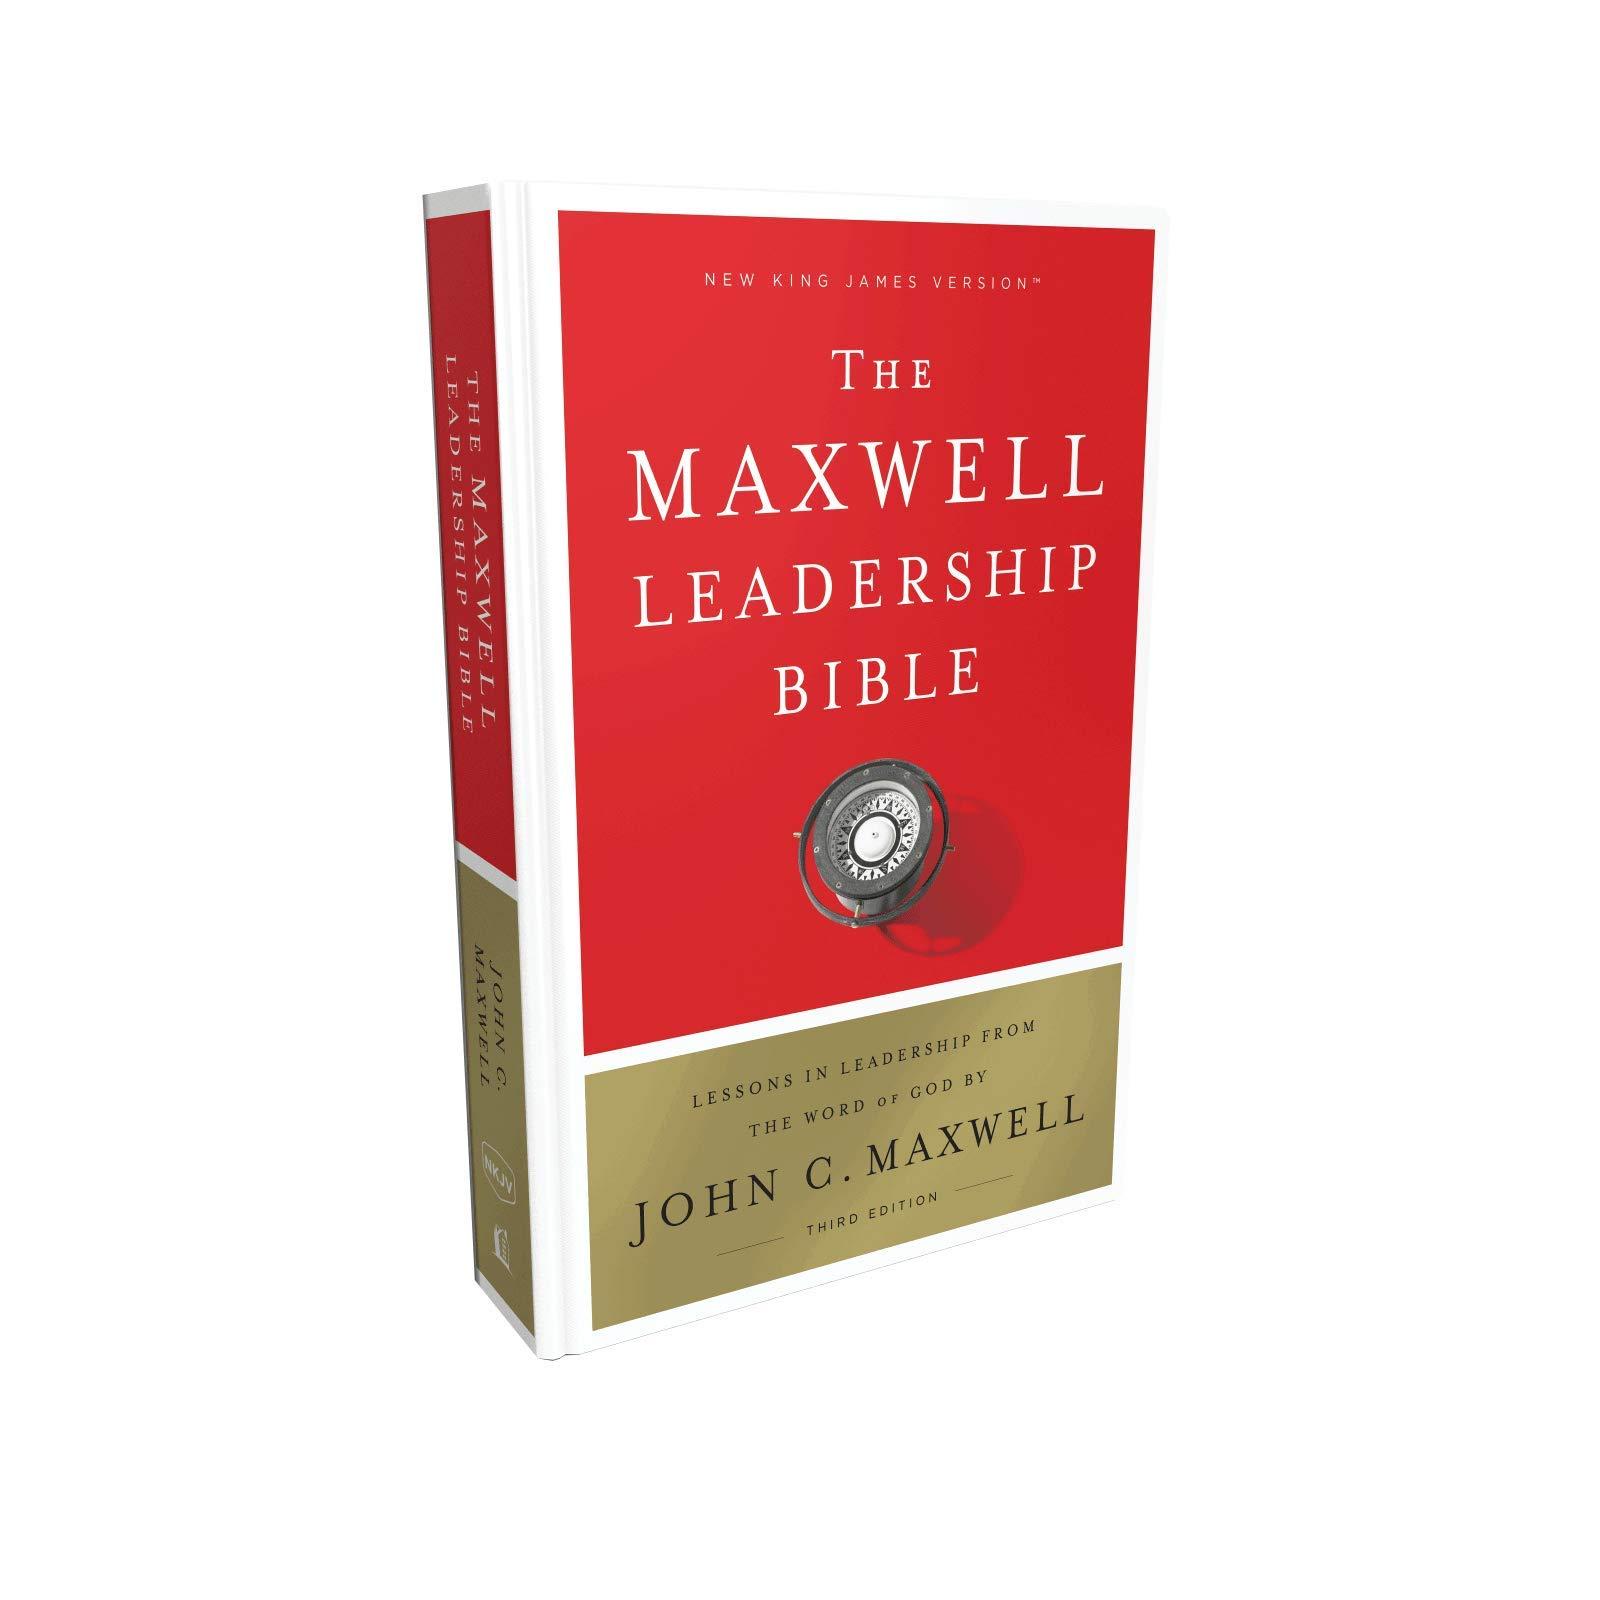 NKJV, Maxwell Leadership Bible, Third Edition, Hardcover, Comfort